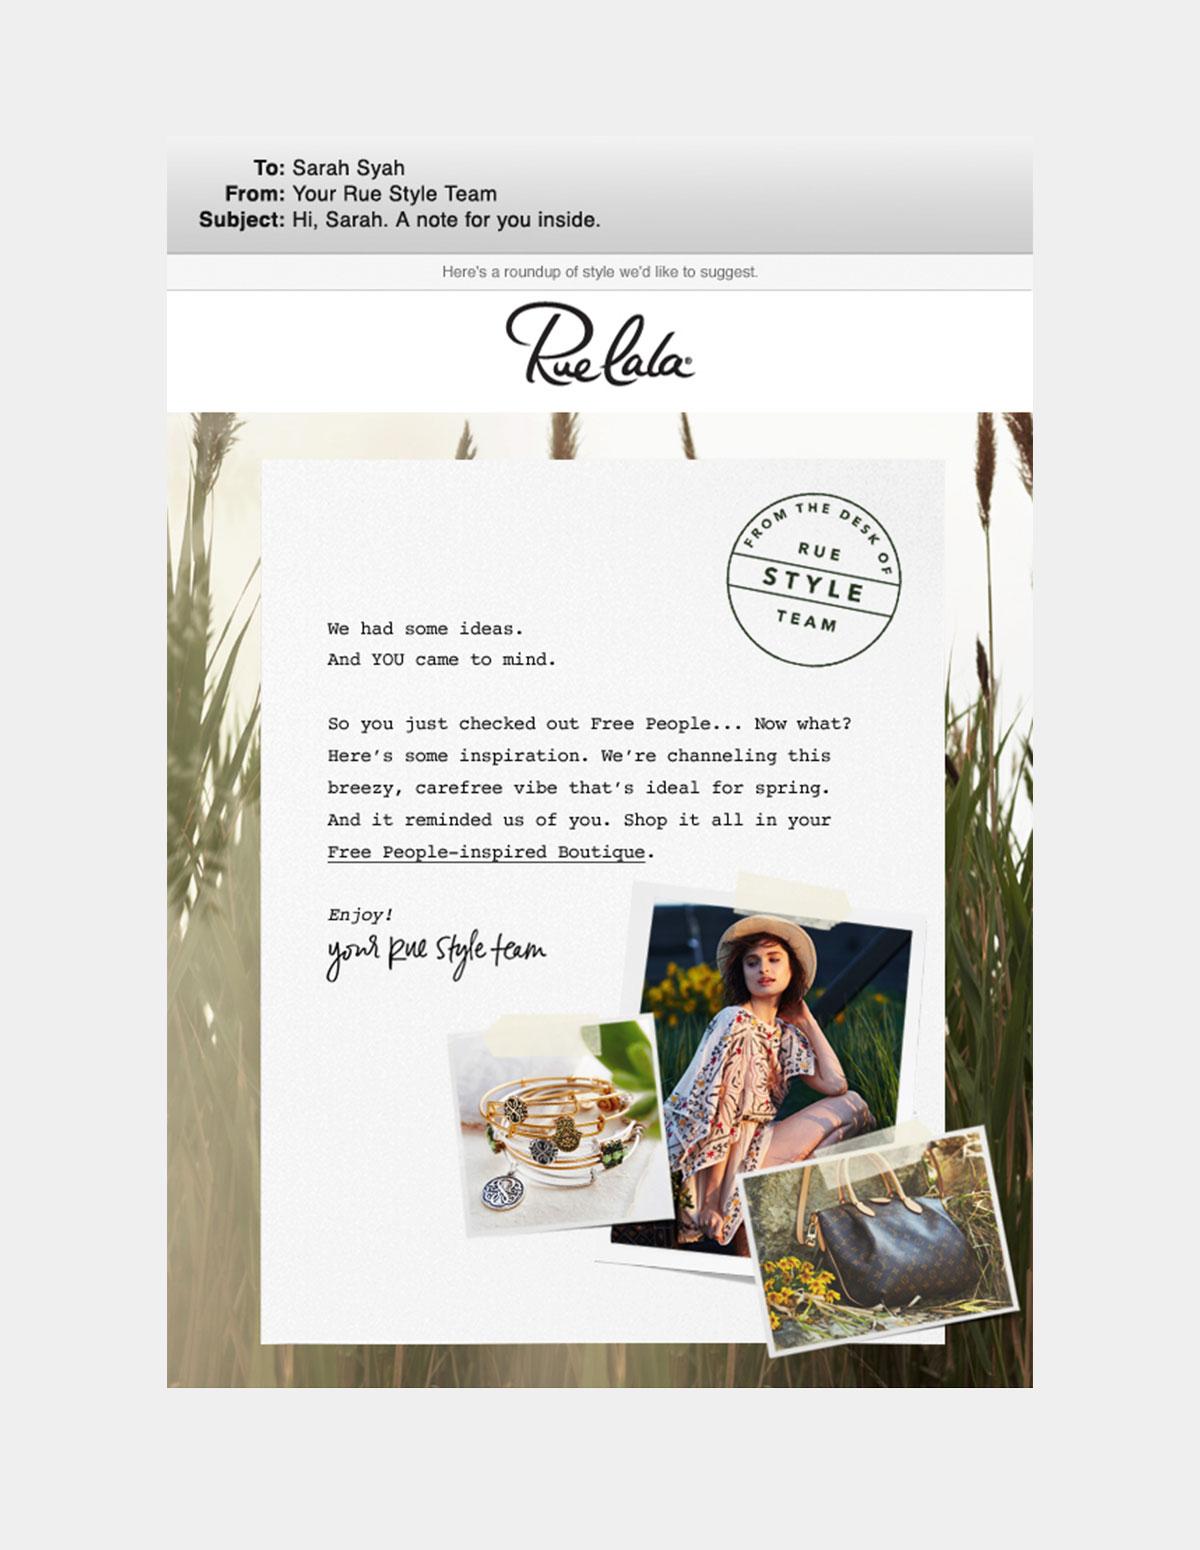 Laura-vanessa-gonzalez-lvg-lvgdesign-lvgworks-art-direction-director-artist-graphic-design-designer-photography-photographer-fashion-editorial-tabletop-set-boston-freelance-type-typeography-email-marketing-4.jpg